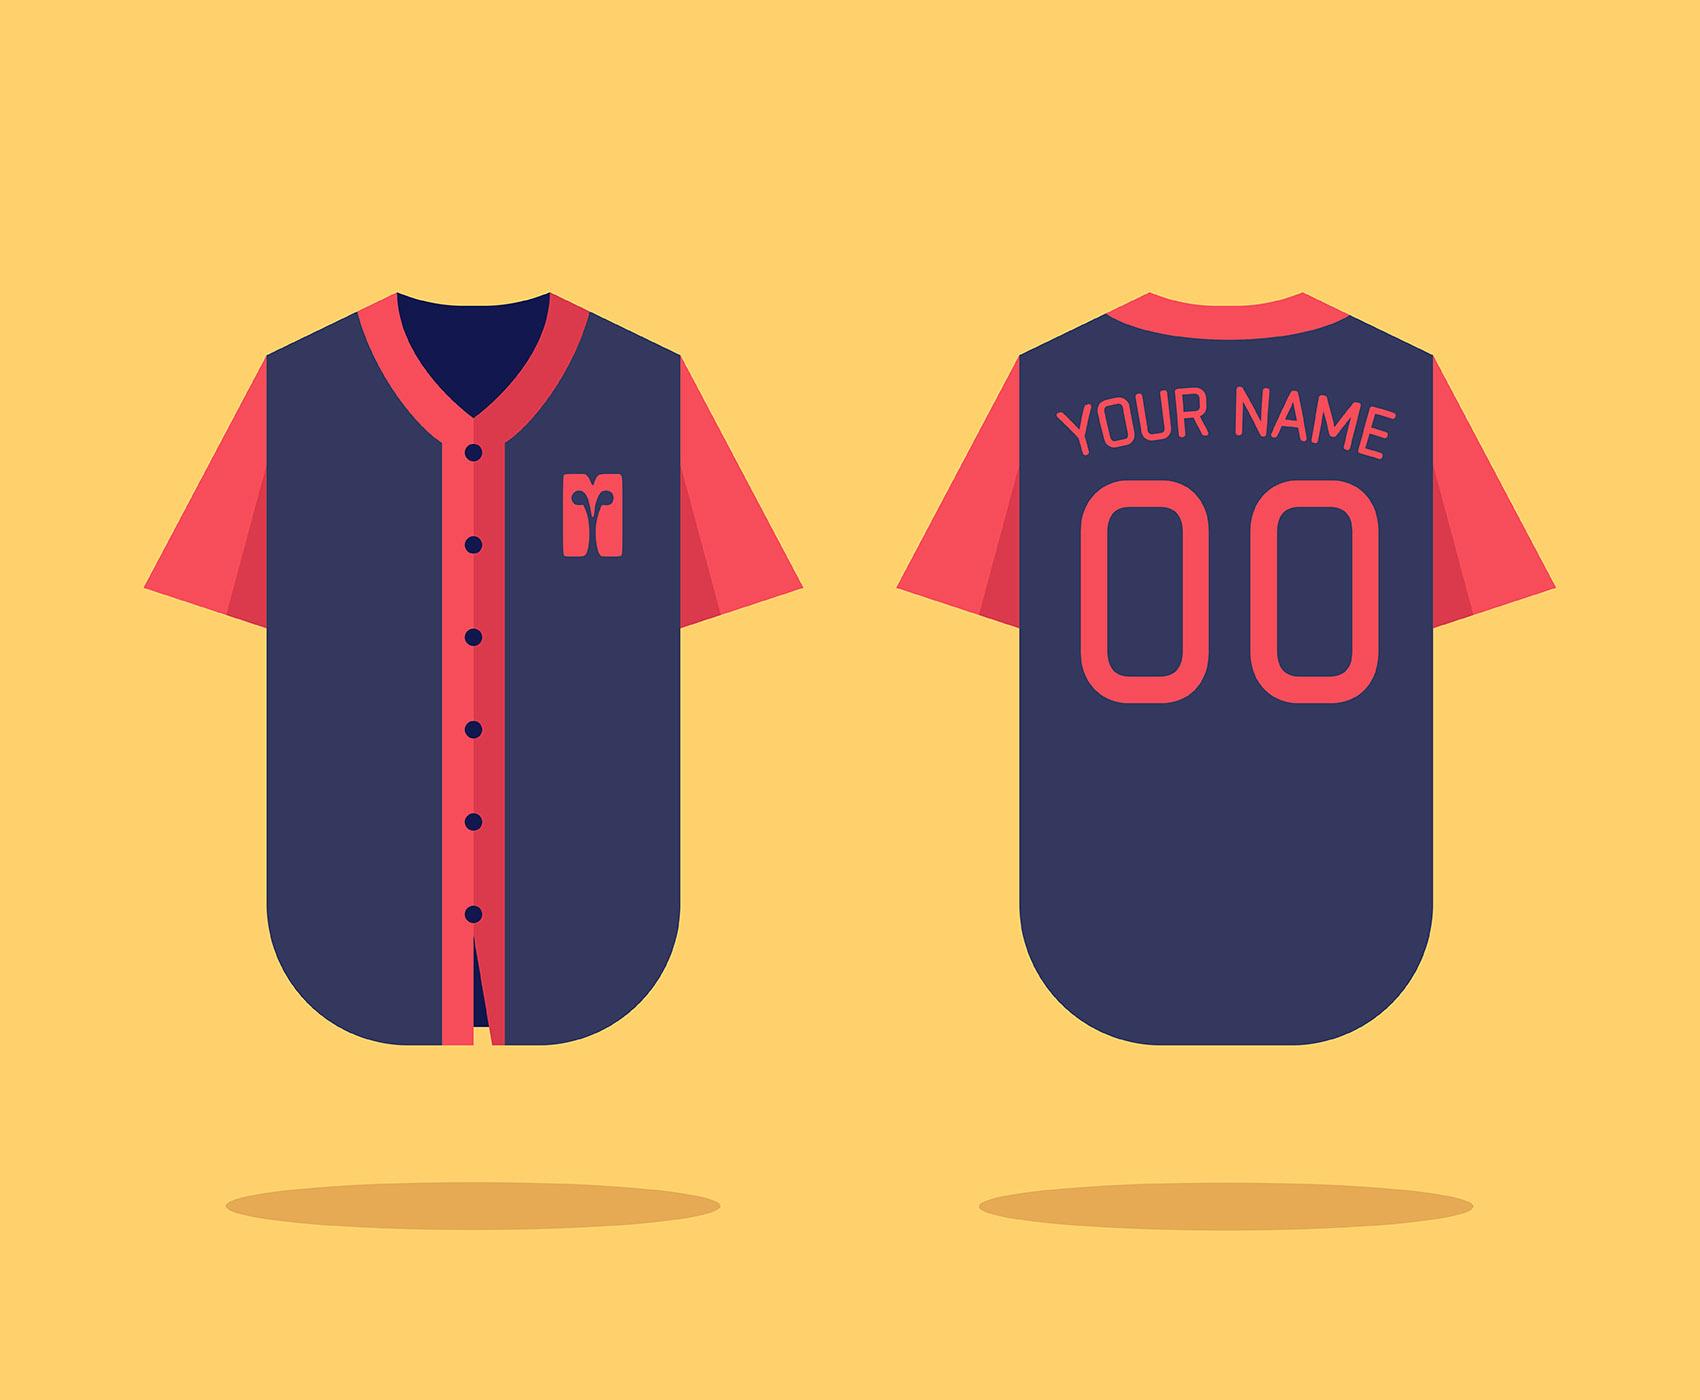 Baseball Jersey Mock-up - Kostenlose Vektor-Kunst, Archiv-Grafiken ...